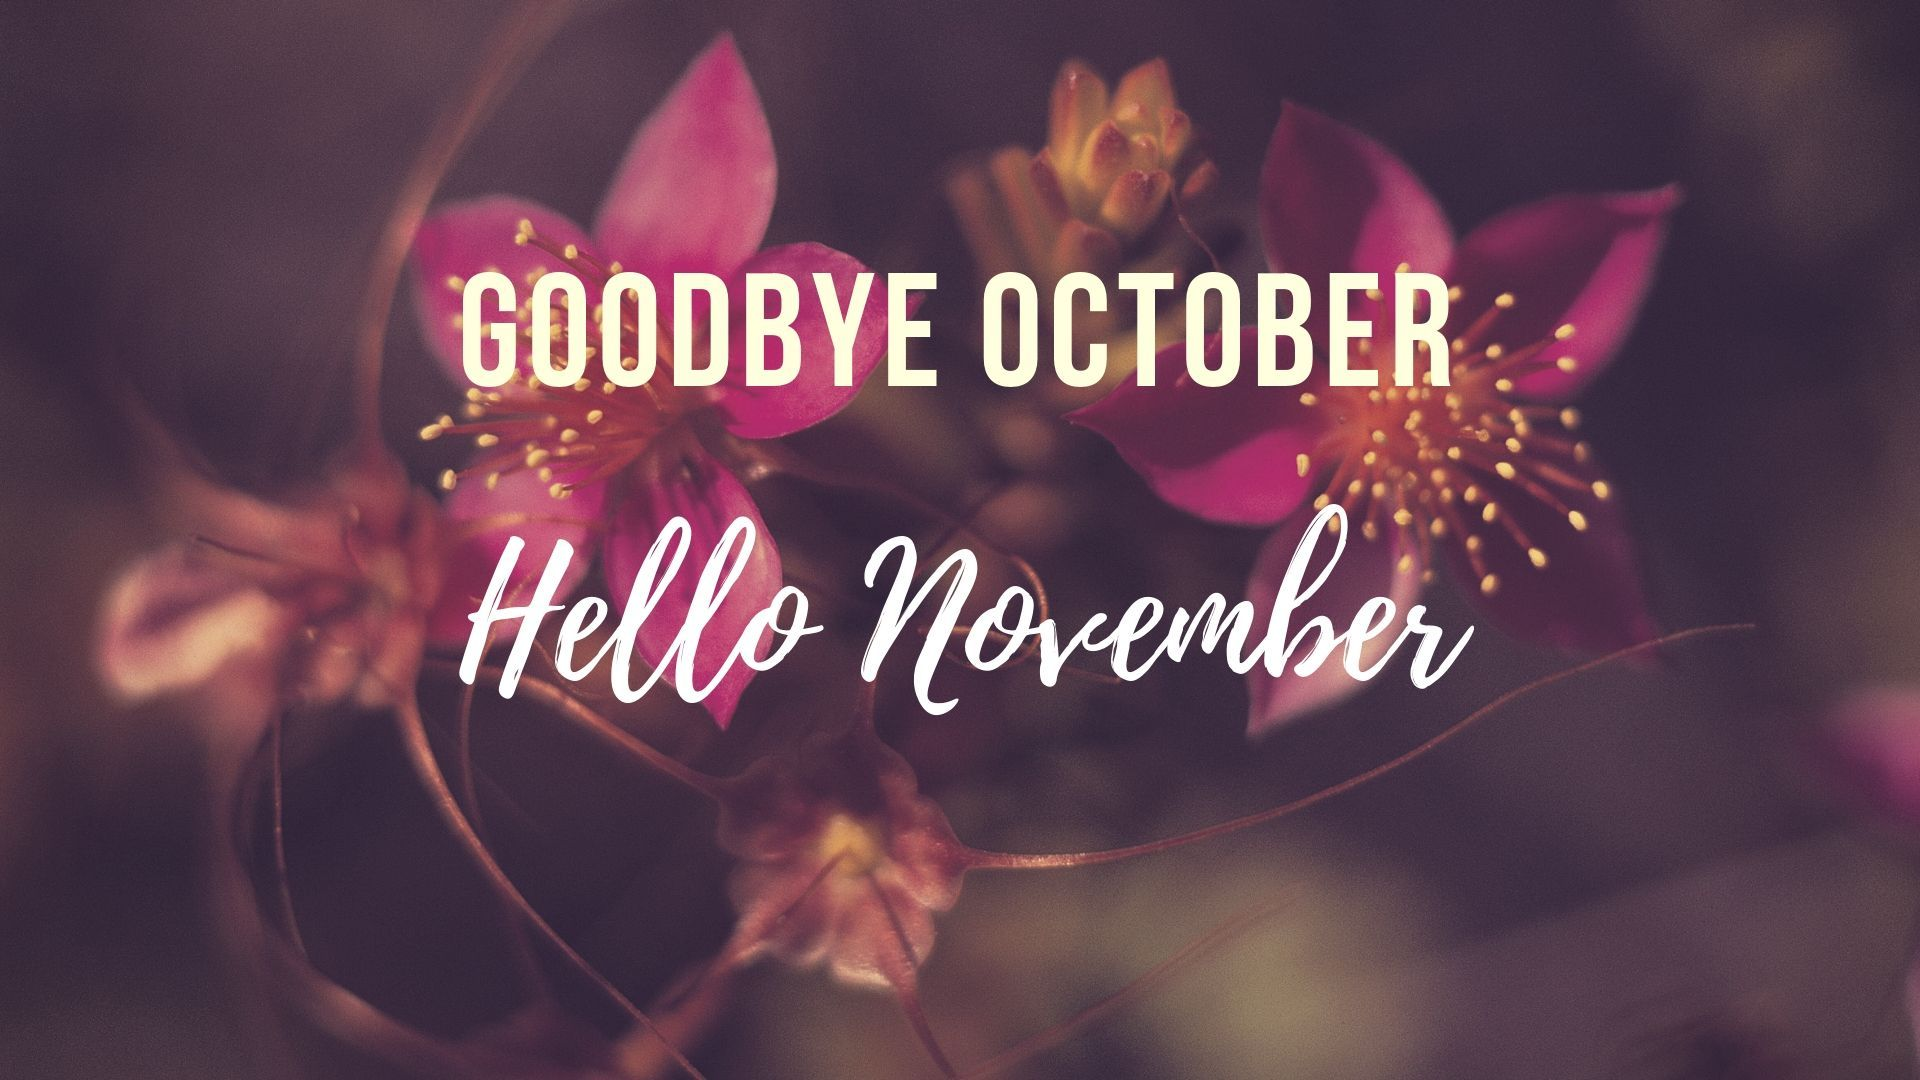 goodbye october hello november hd photo #hellonovemberwallpaper